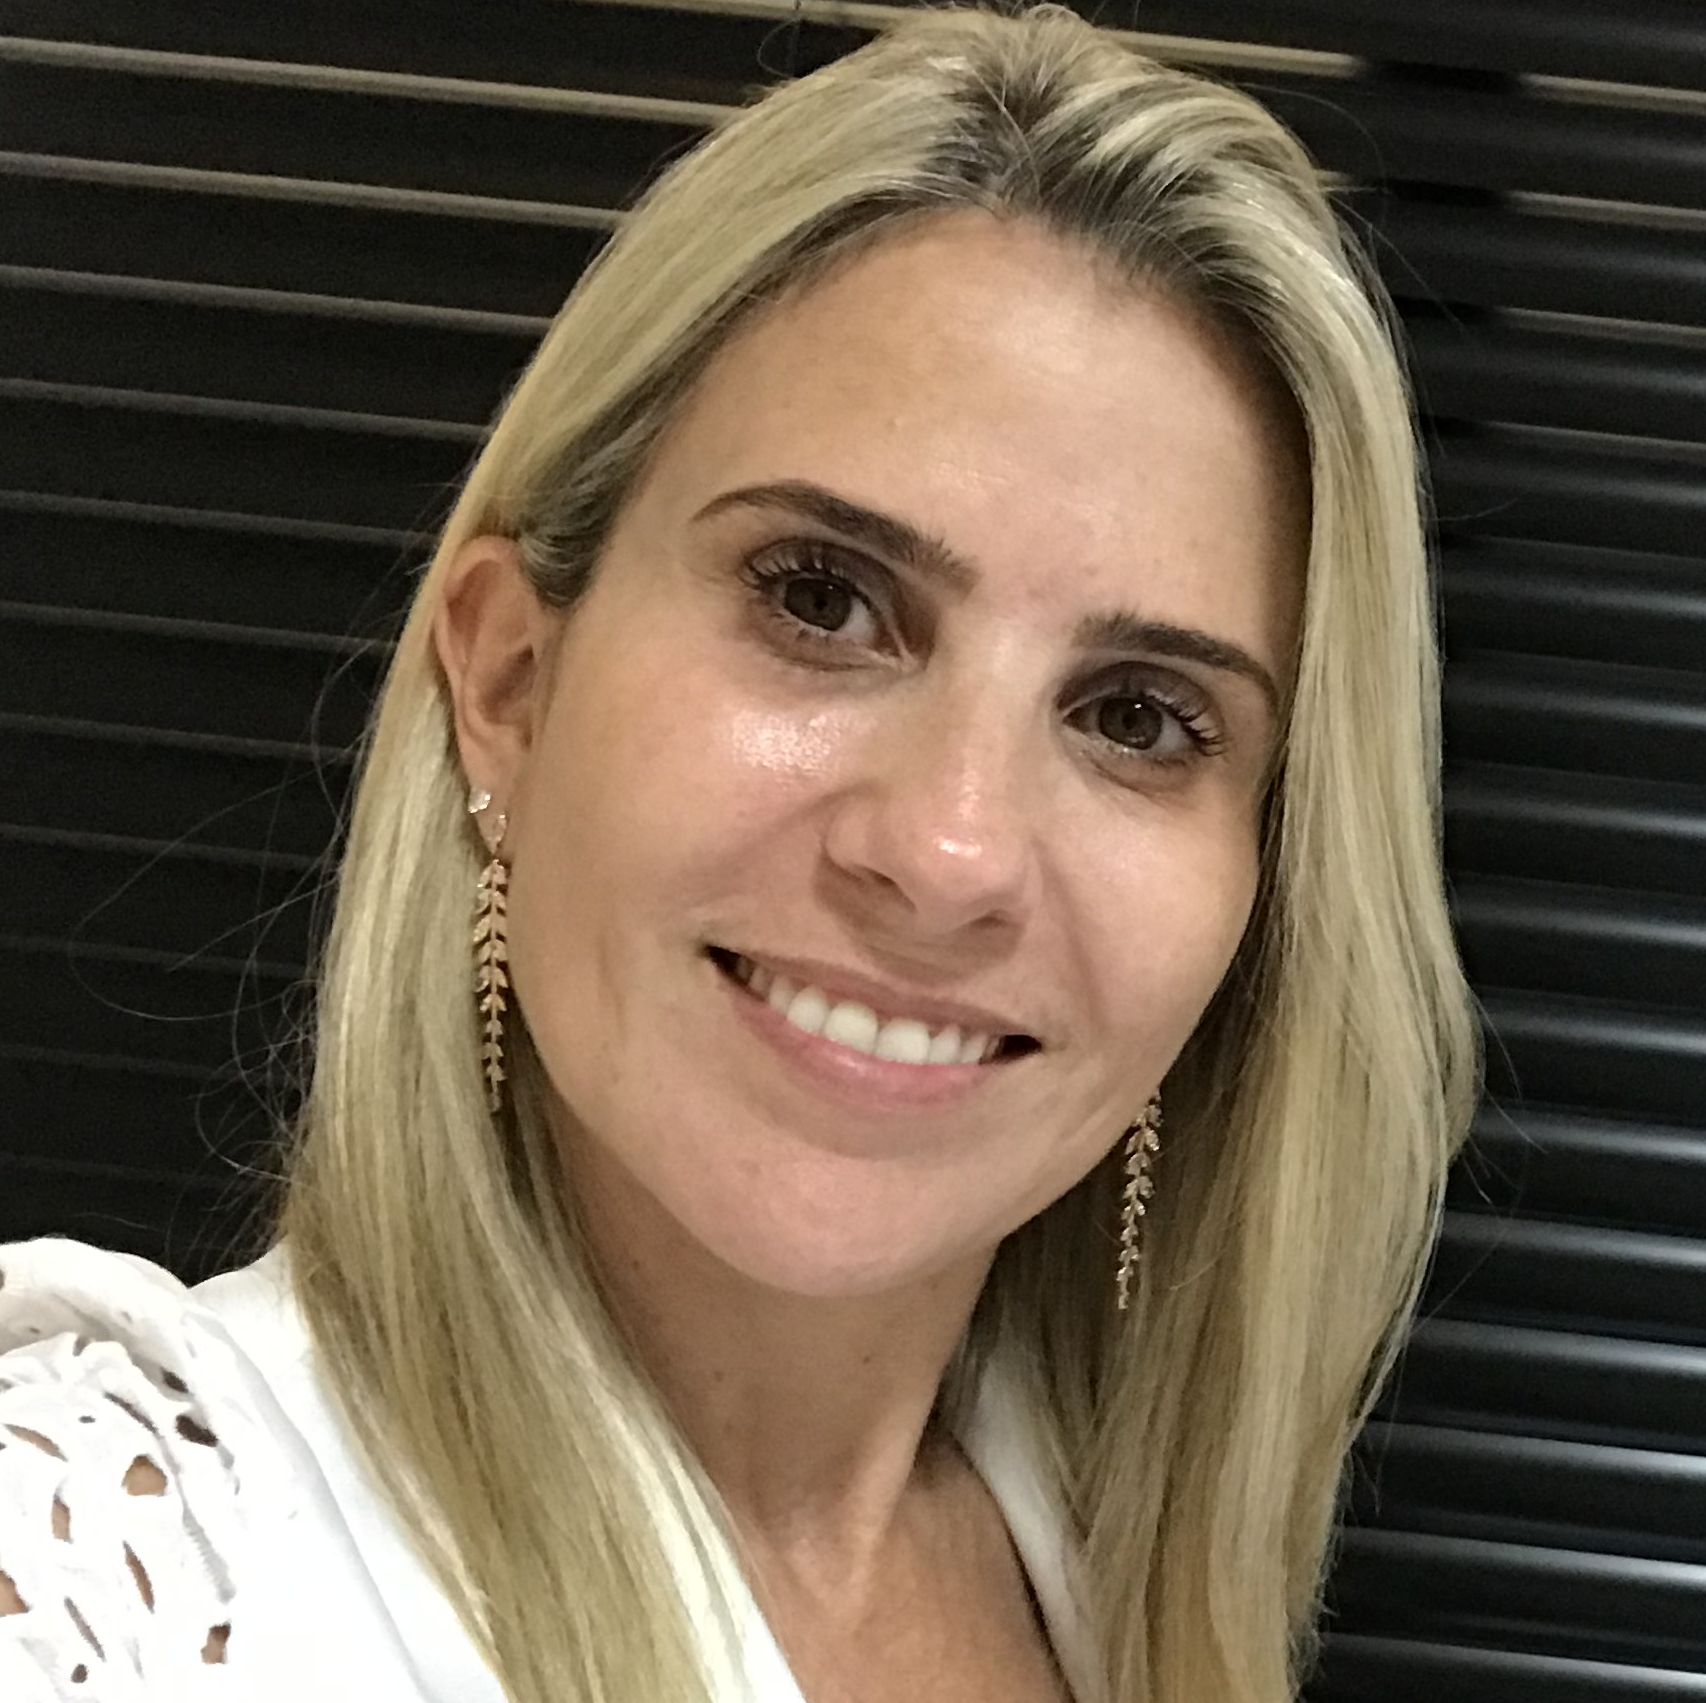 Ana Maria Guidetti de Amorim Garcia